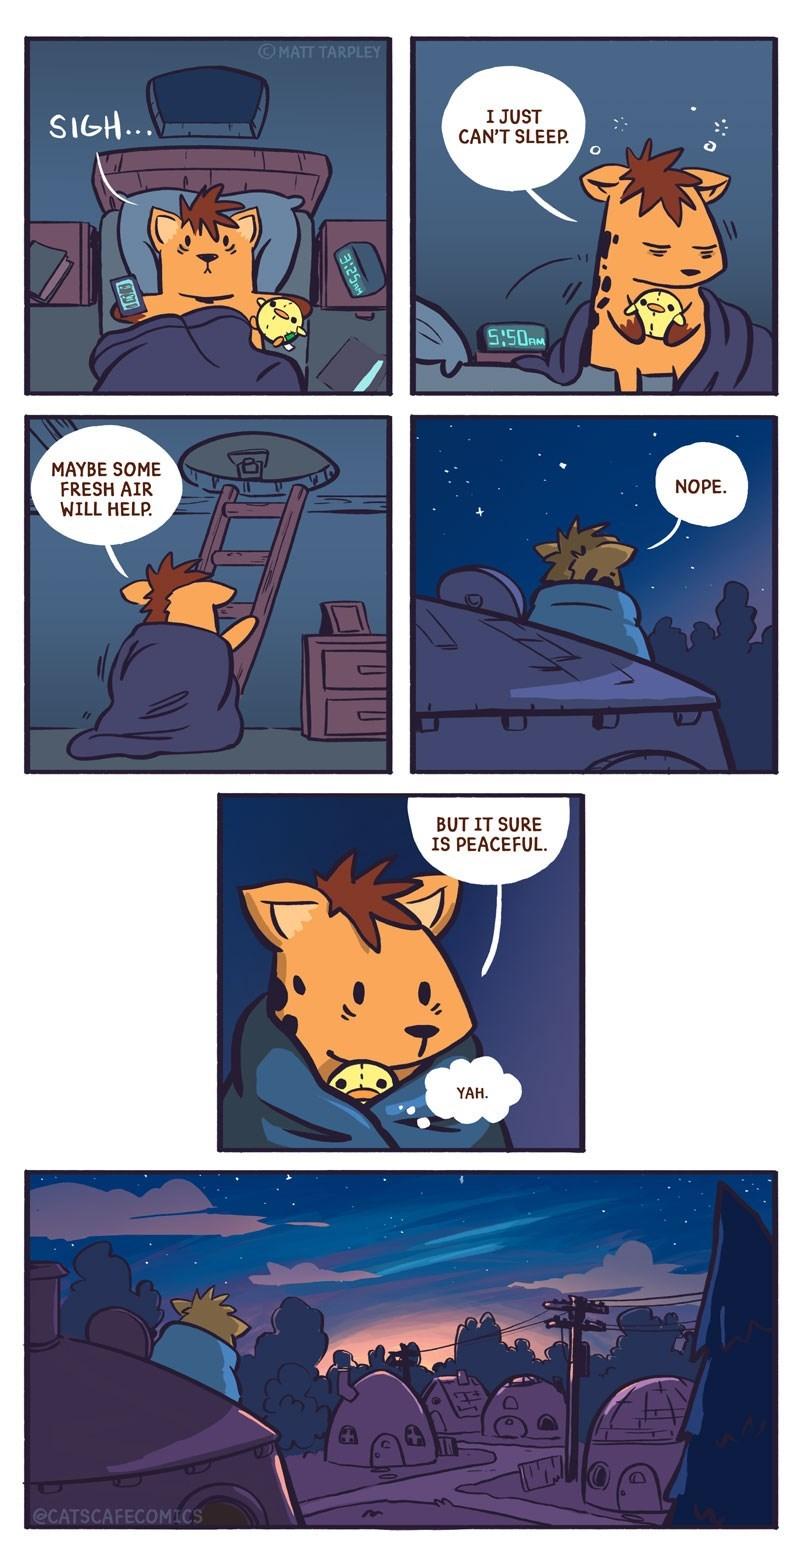 Comics - OMATT TARPLEY SIGH... I JUST CAN'T SLEEP. S:50AM MAYBE SOME FRESH AIR WILL HELP. NOPE. BUT IT SURE IS PEACEFUL. YAH. @CATSCAFECOMICS